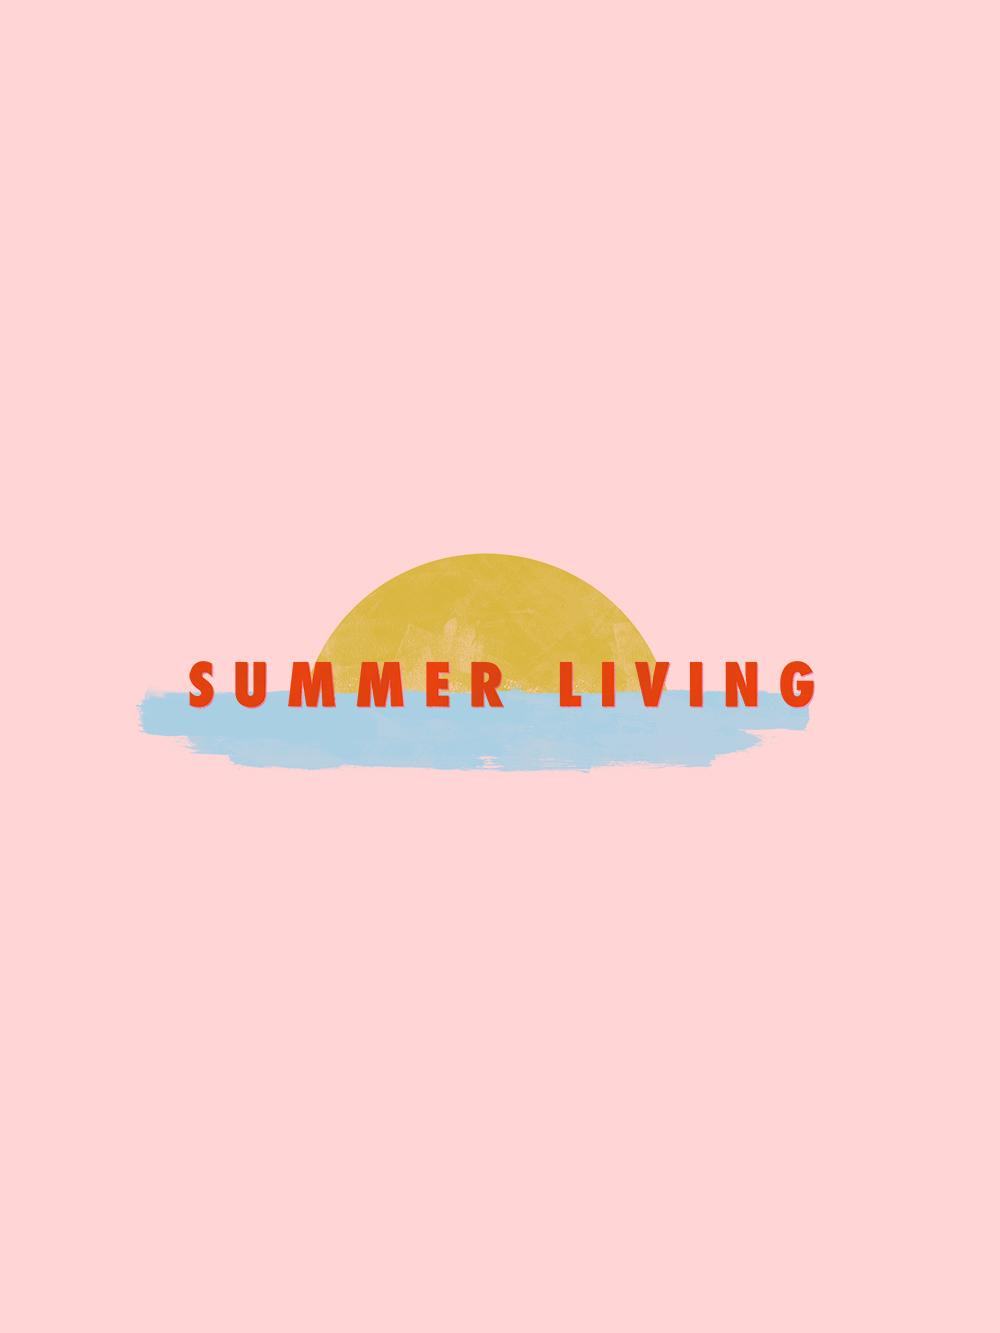 Summer Living